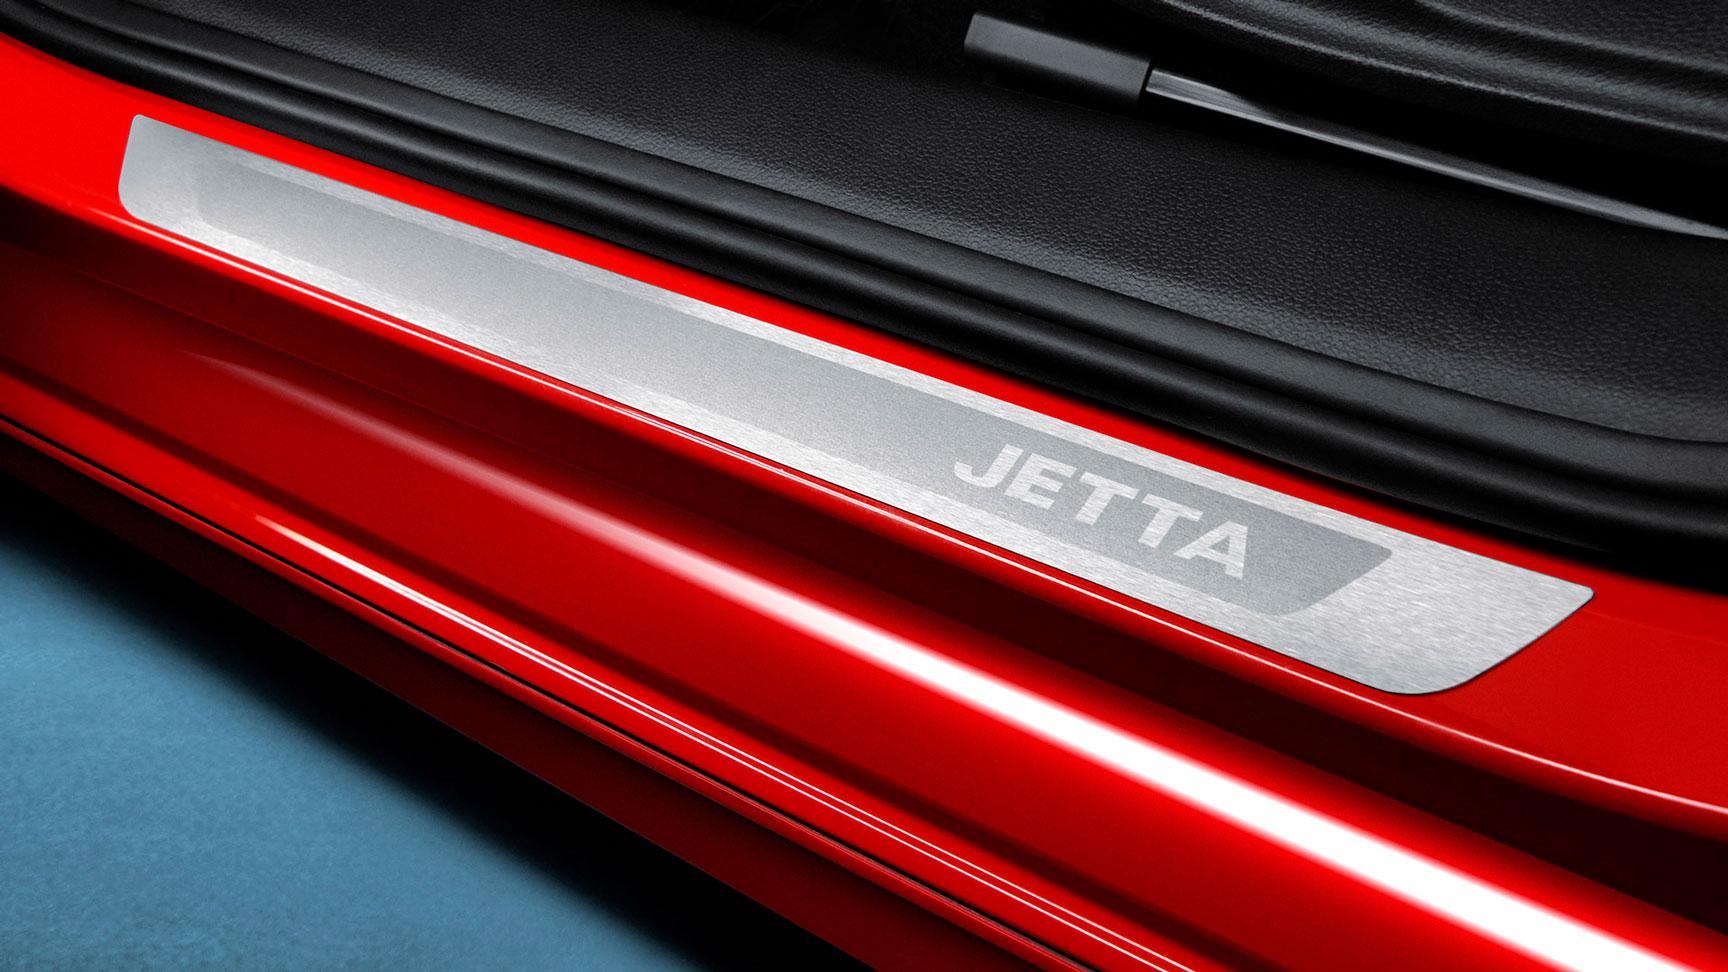 Accesorio embellecedor de estribo para Jetta A6 Volkswagen original.